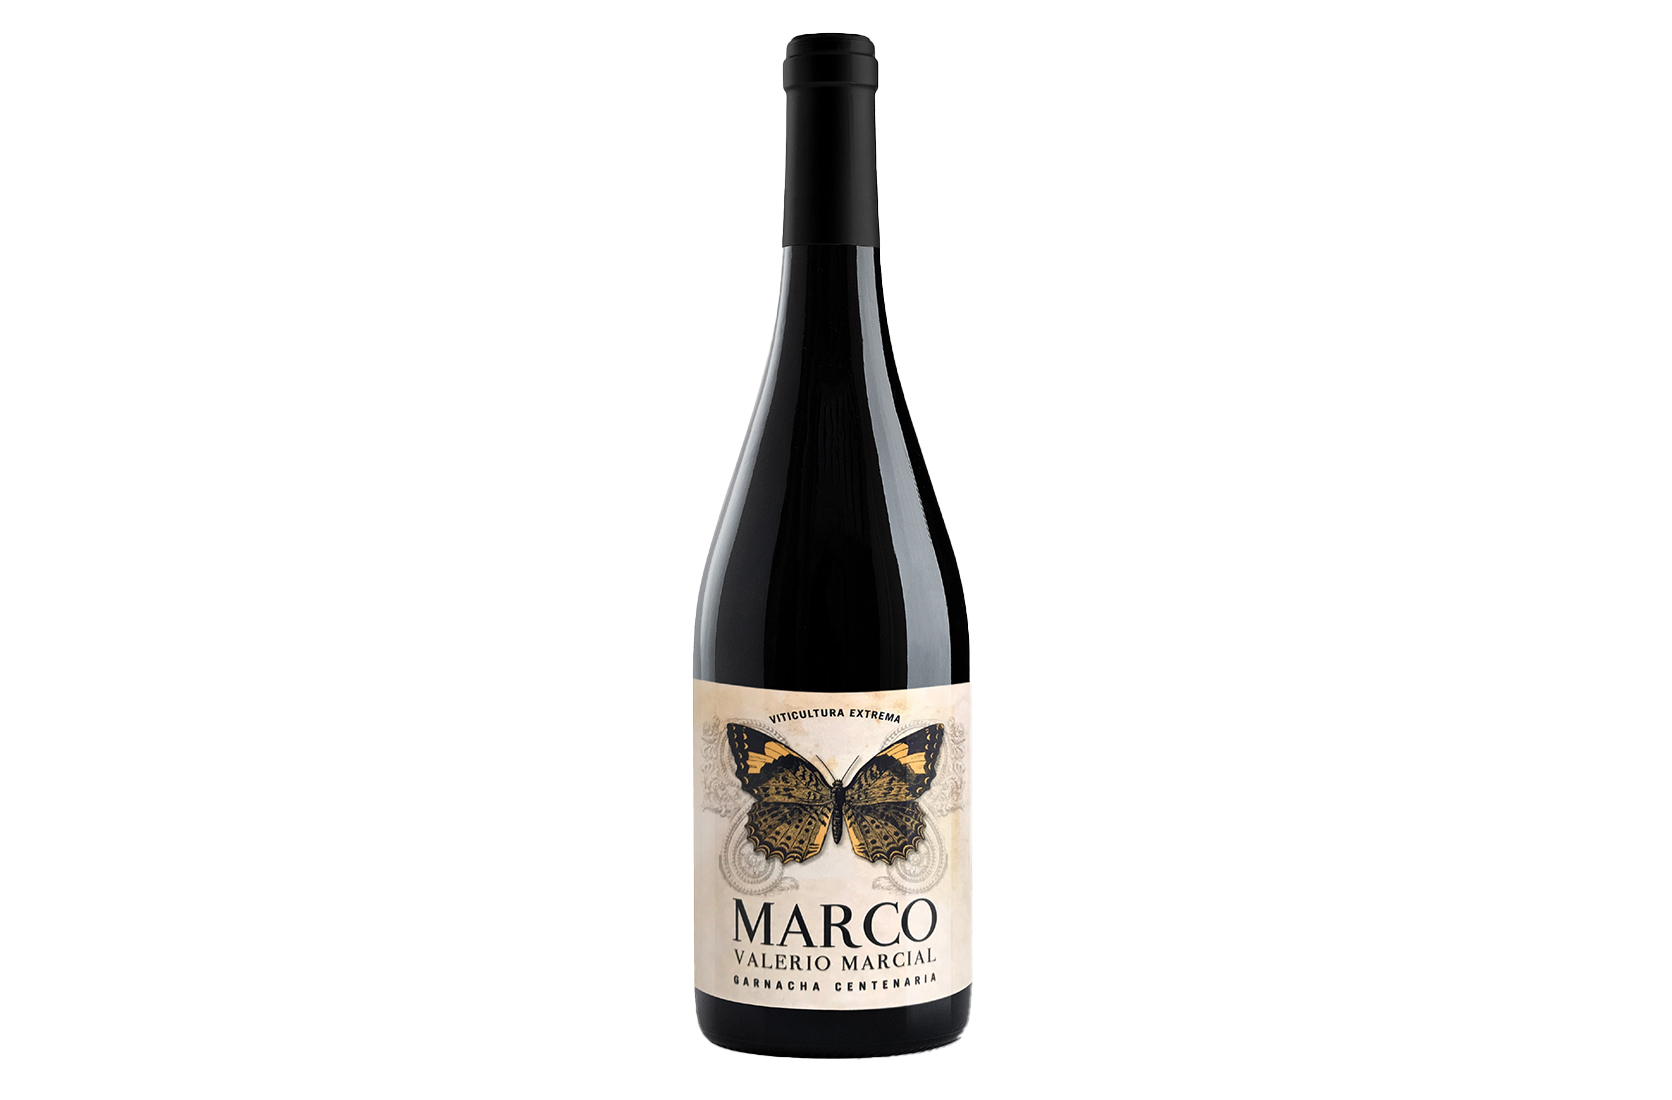 MARCO Valerio Marcial 2017